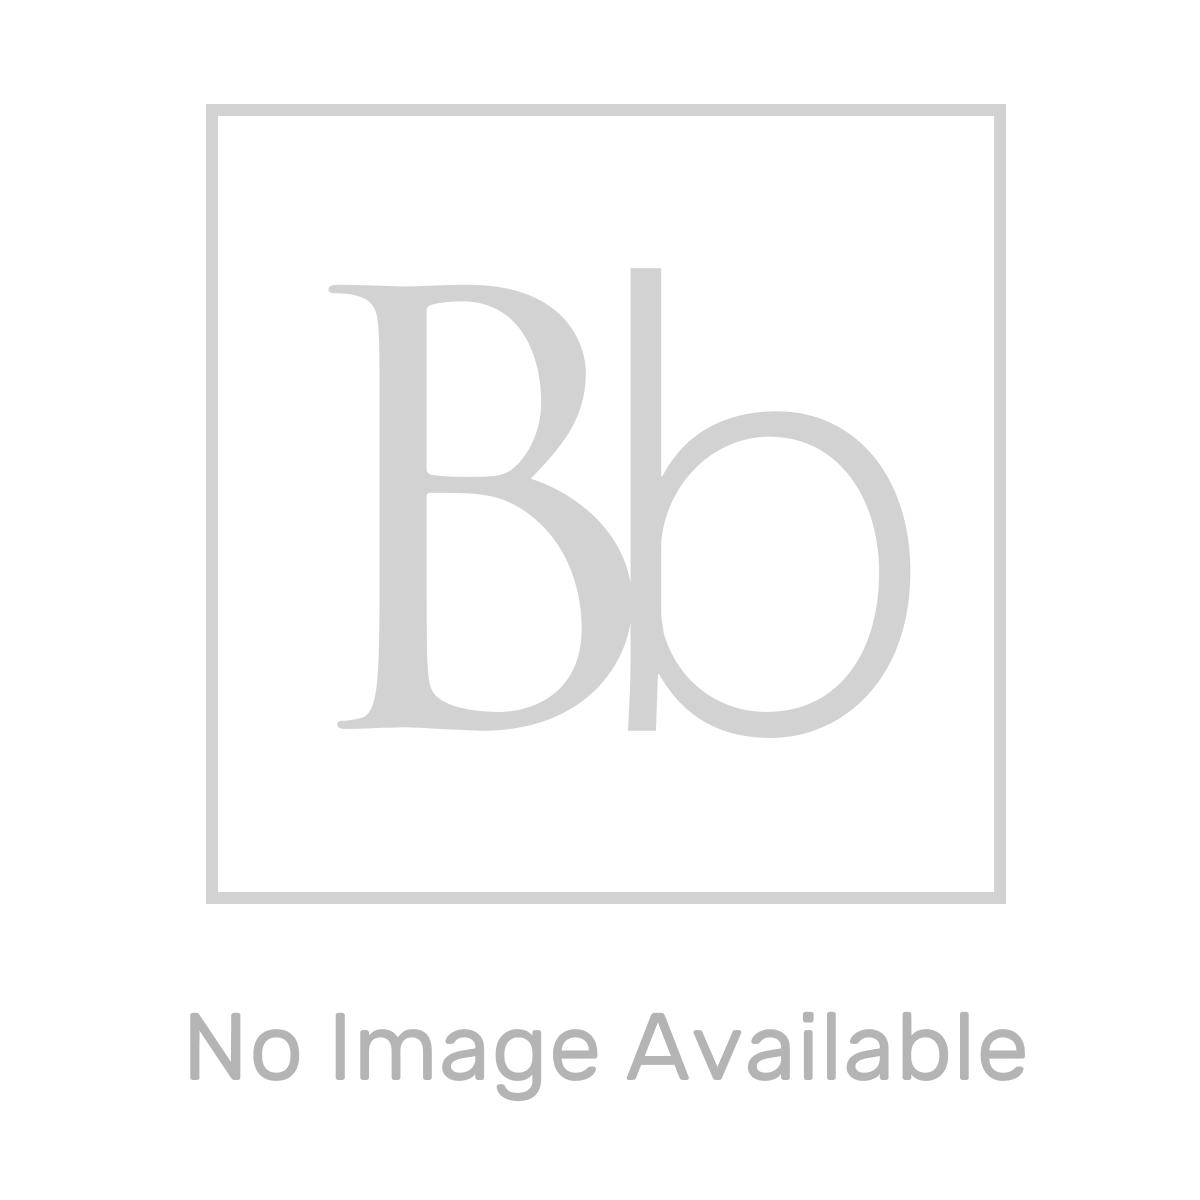 BTL Lucia Grey Ash Soft Close Toilet Seat